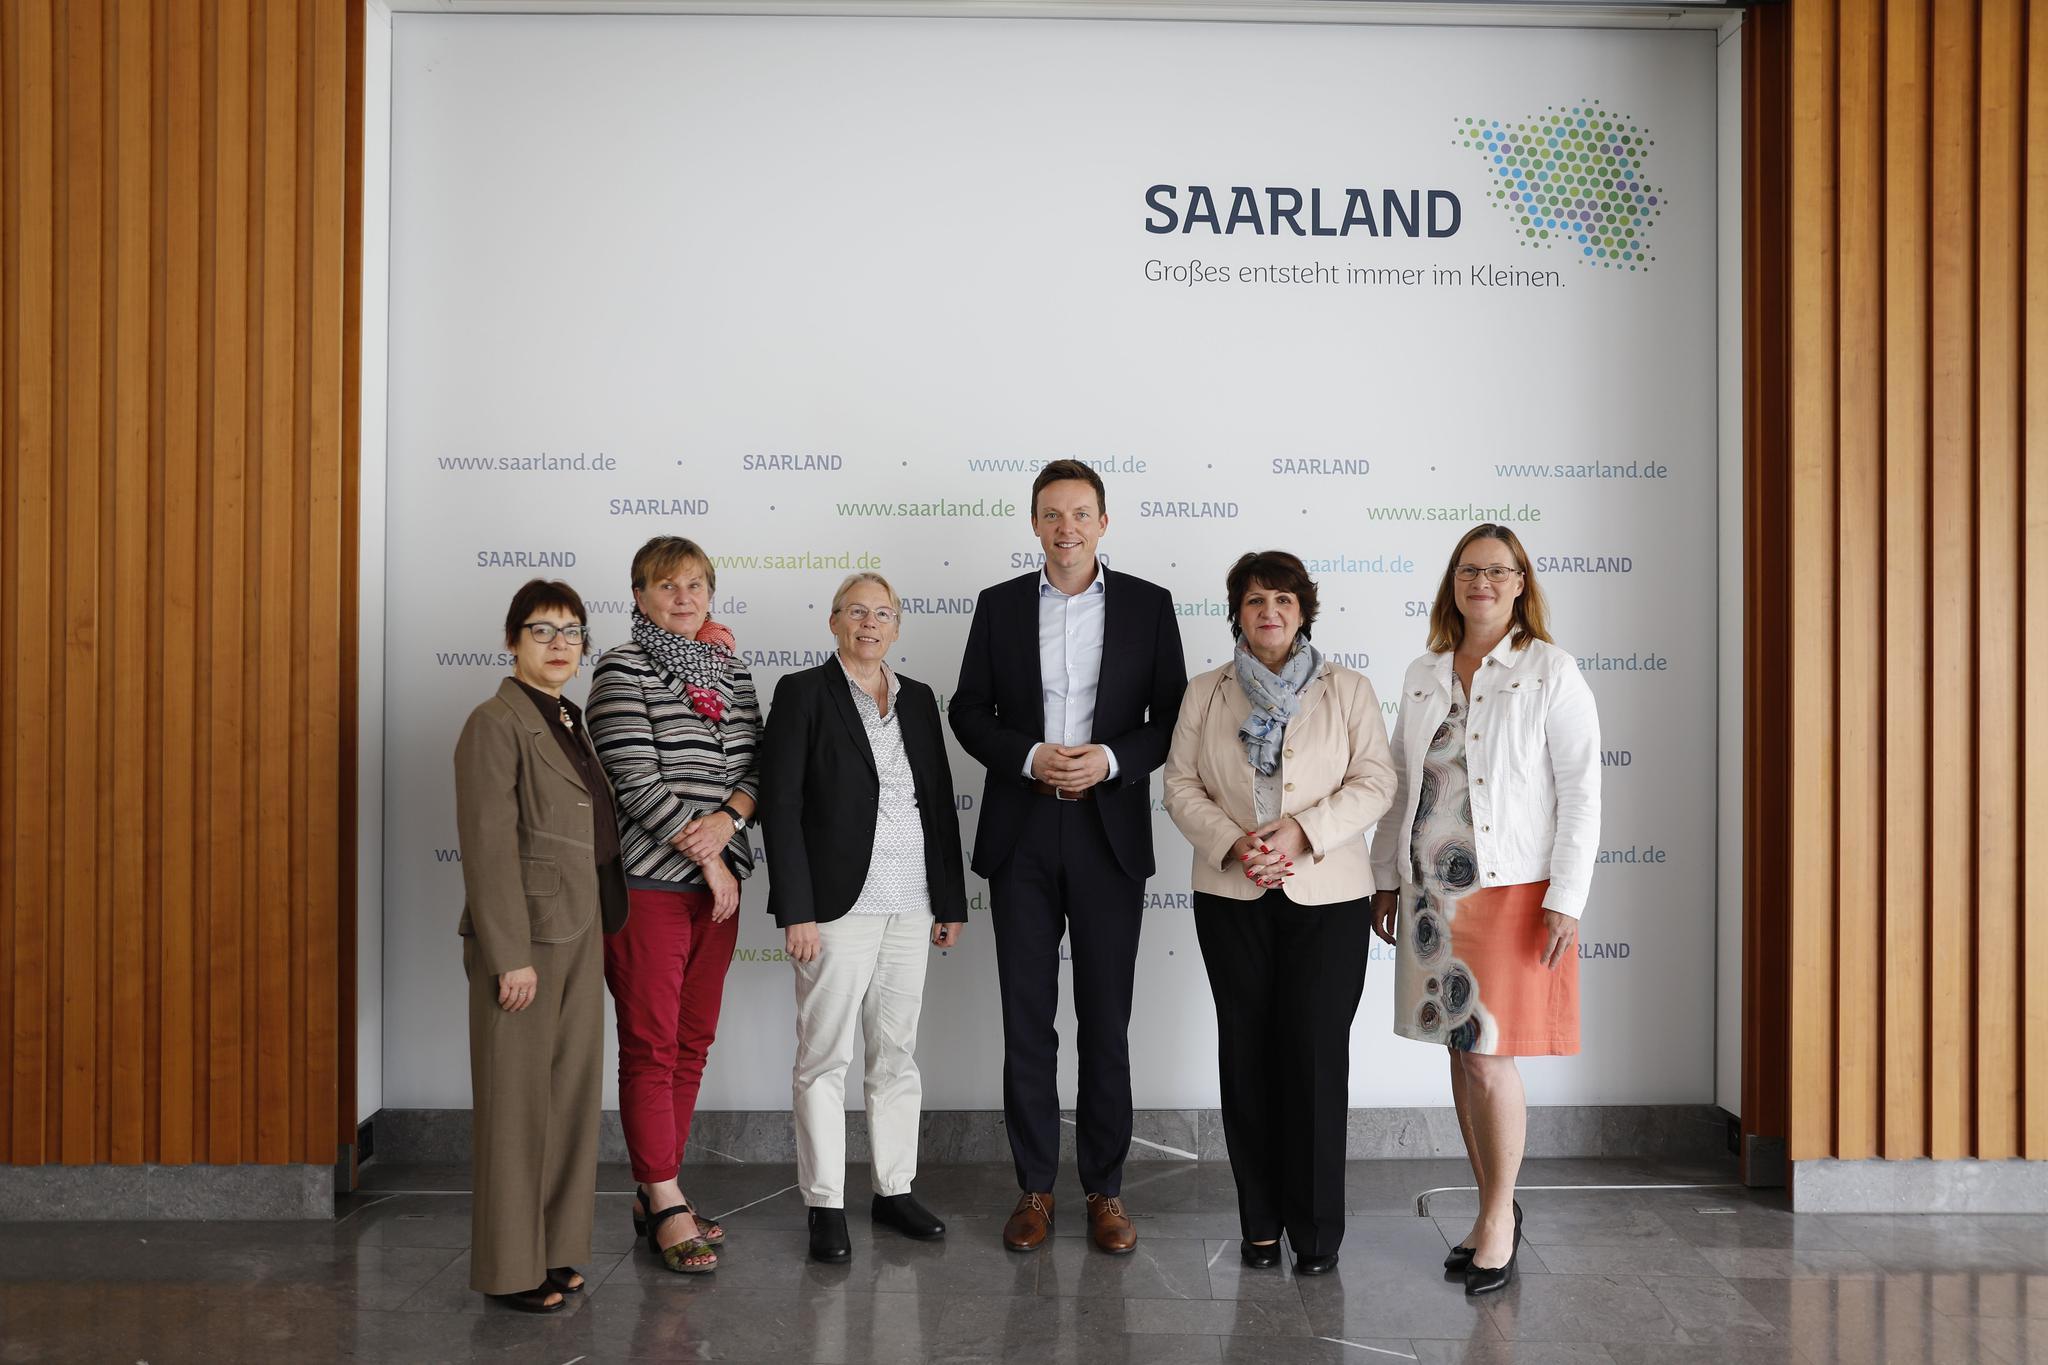 Frauenrat Saarland beim Ministerpräsidenten